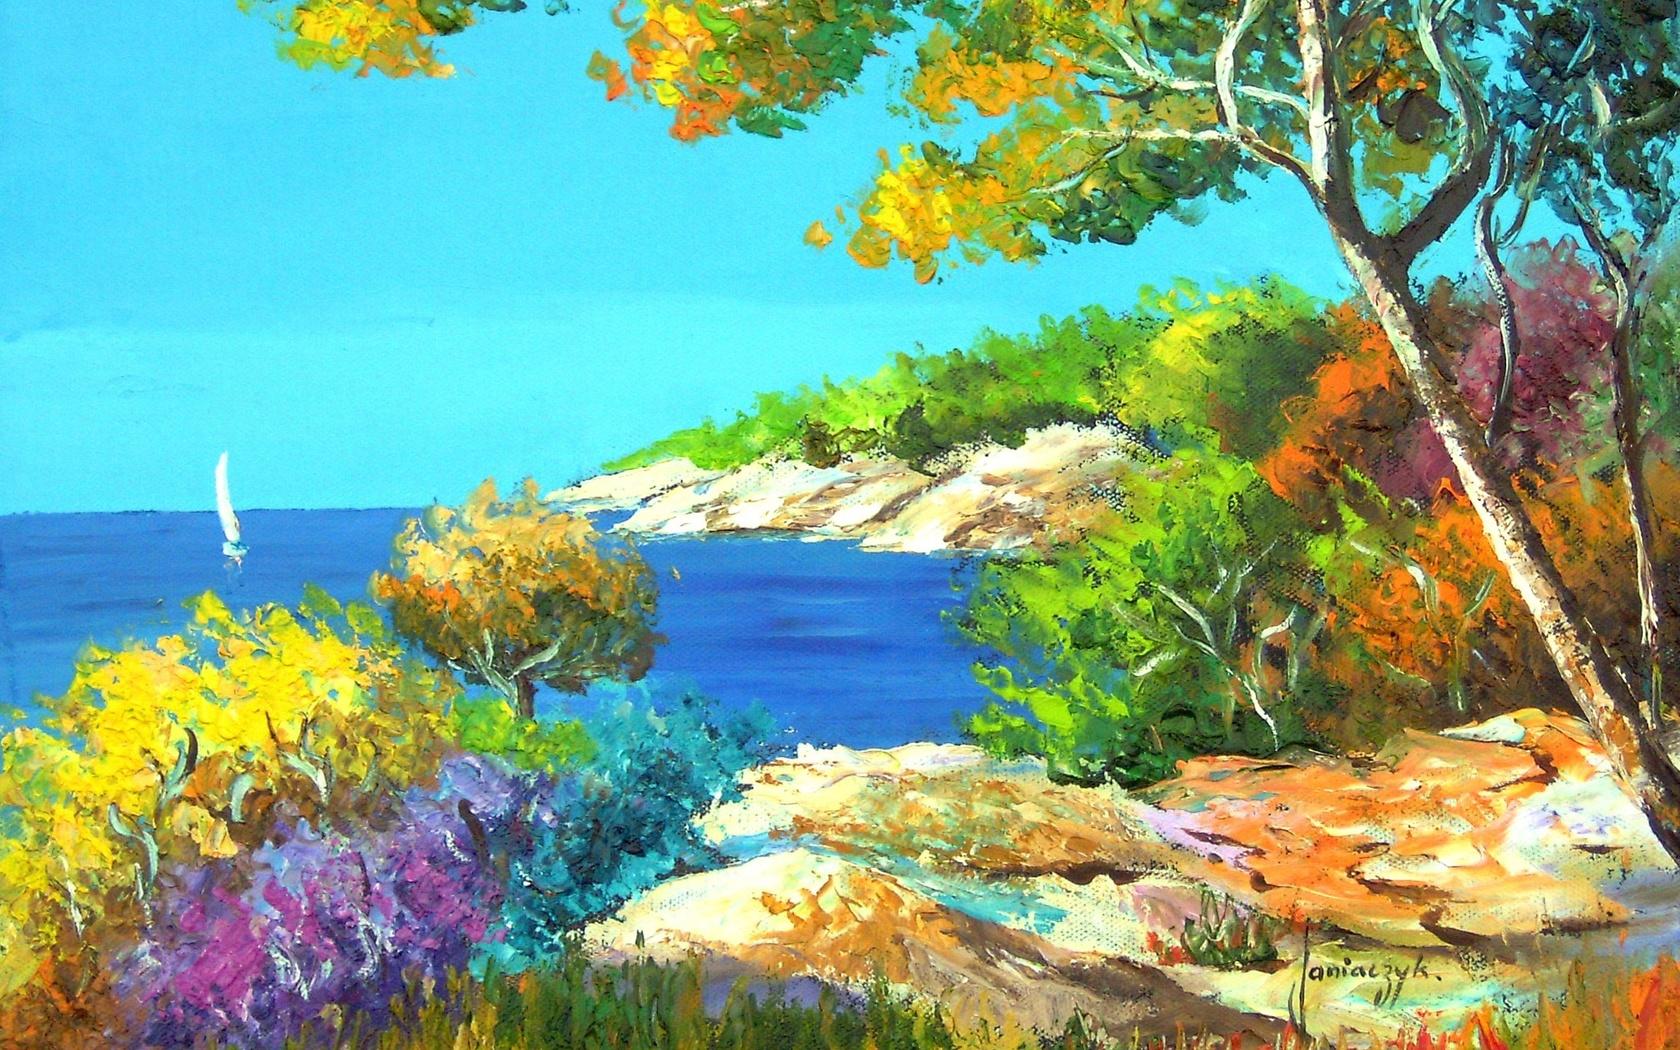 sea, art, artist, shore, impressionist, jean marc janiaczyk, landscape